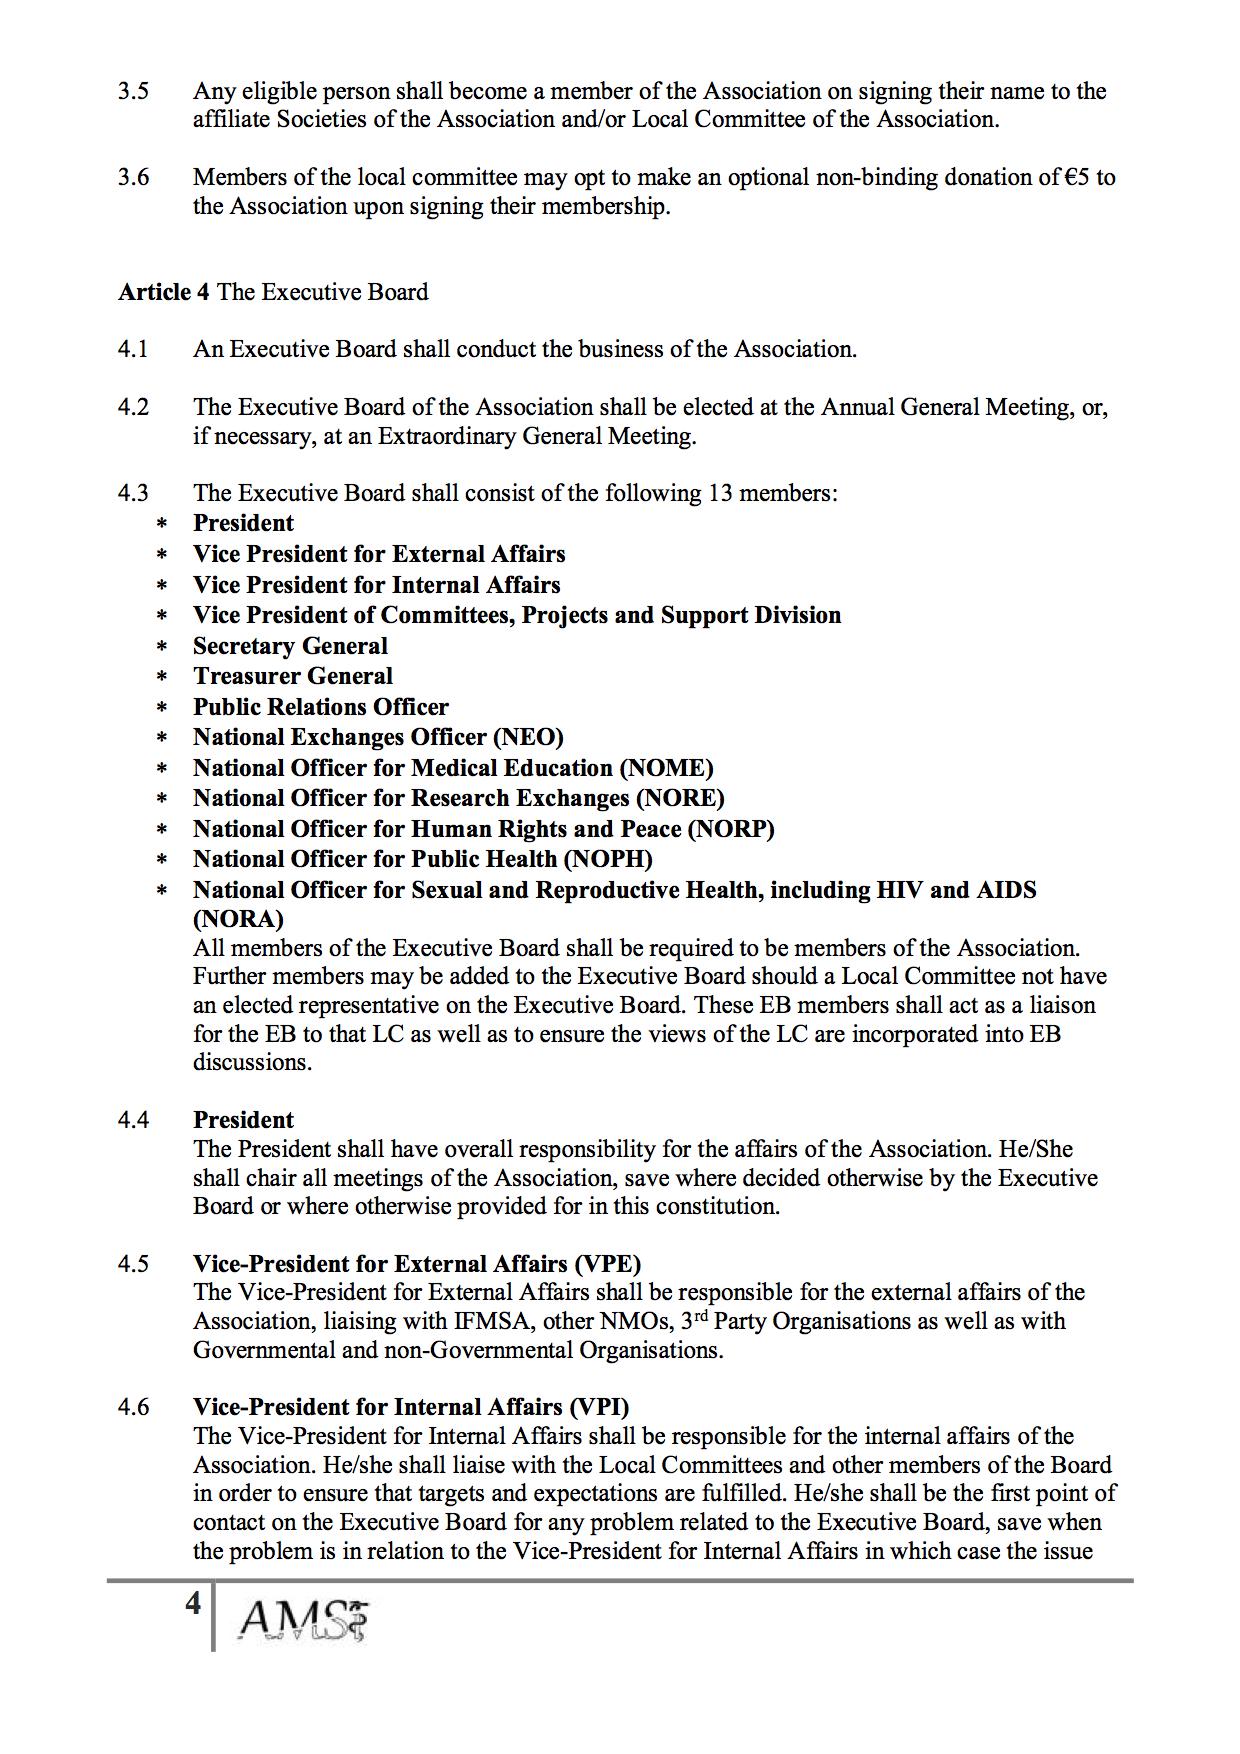 AMSI-FInal-Constitution 4.jpg